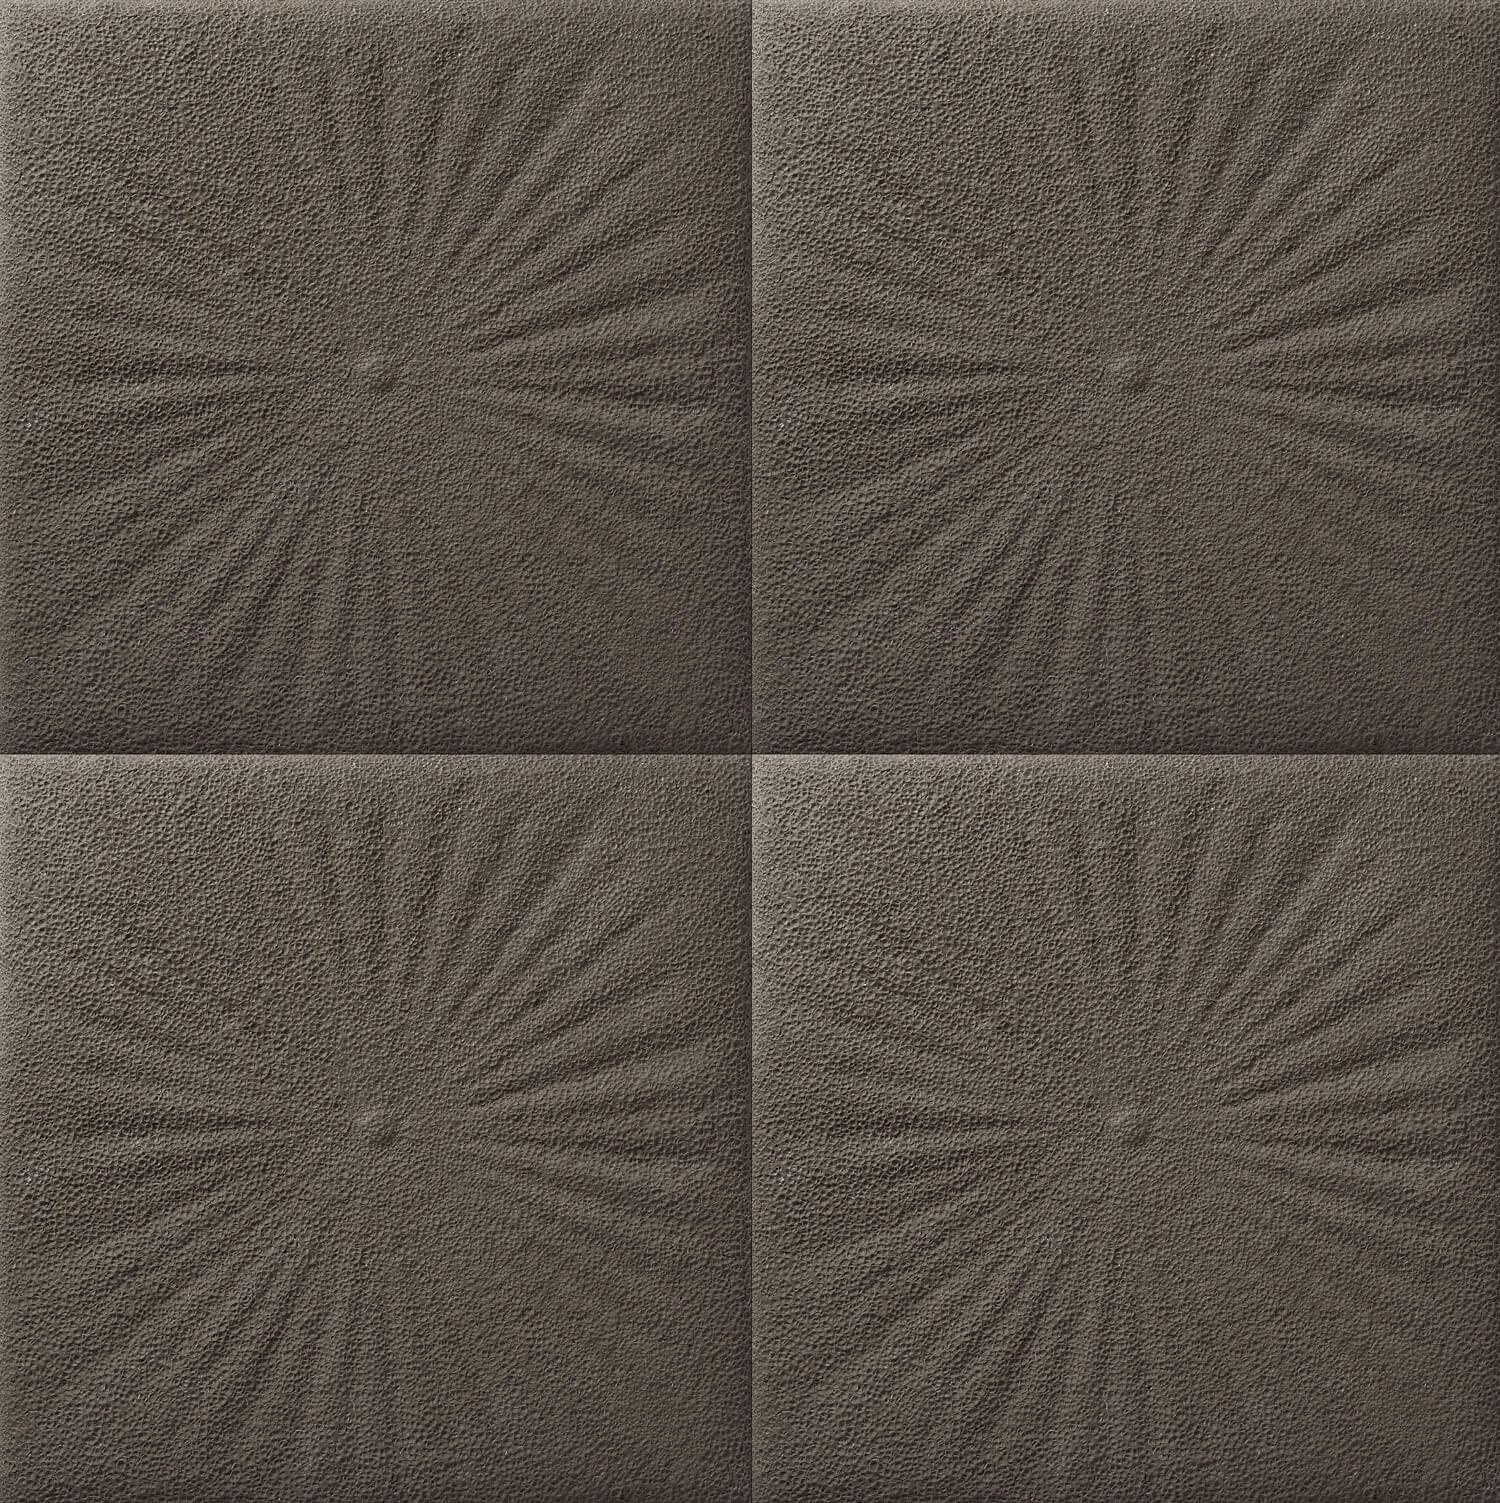 Plaster_studio_tile_sq_19_concrete